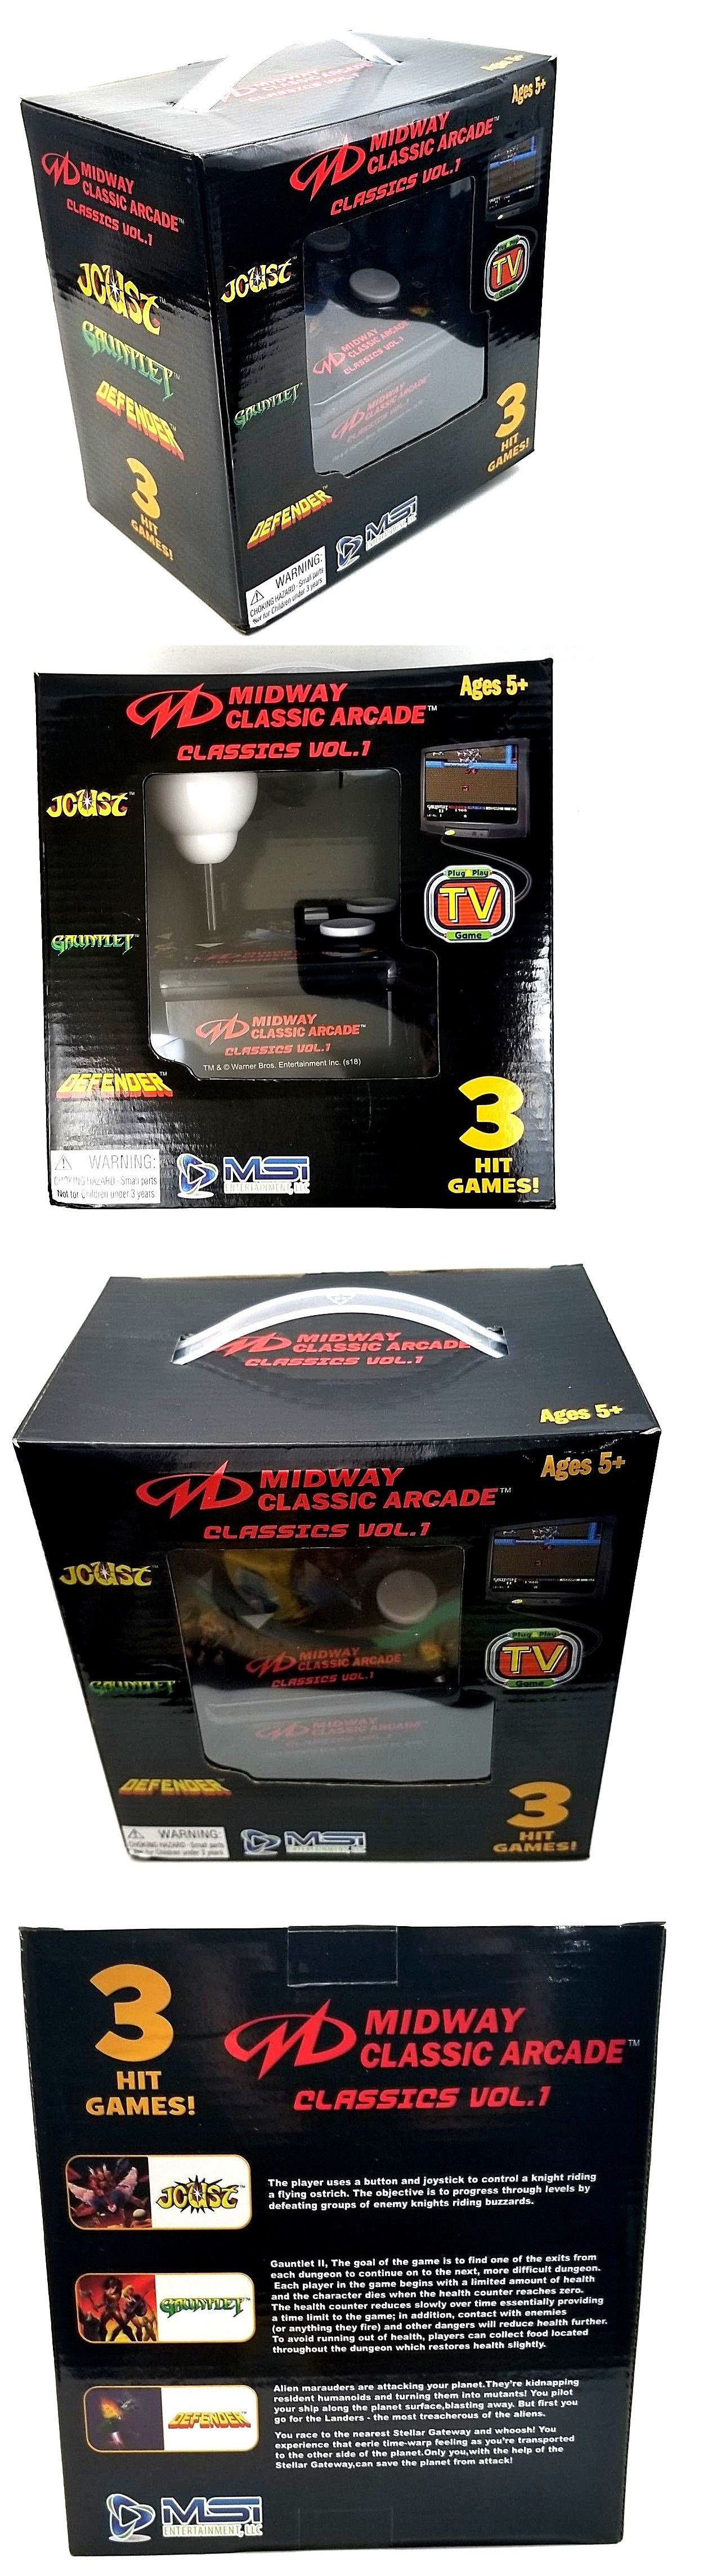 Electronic Games 2540 Midway Classic Arcade Classics Vol